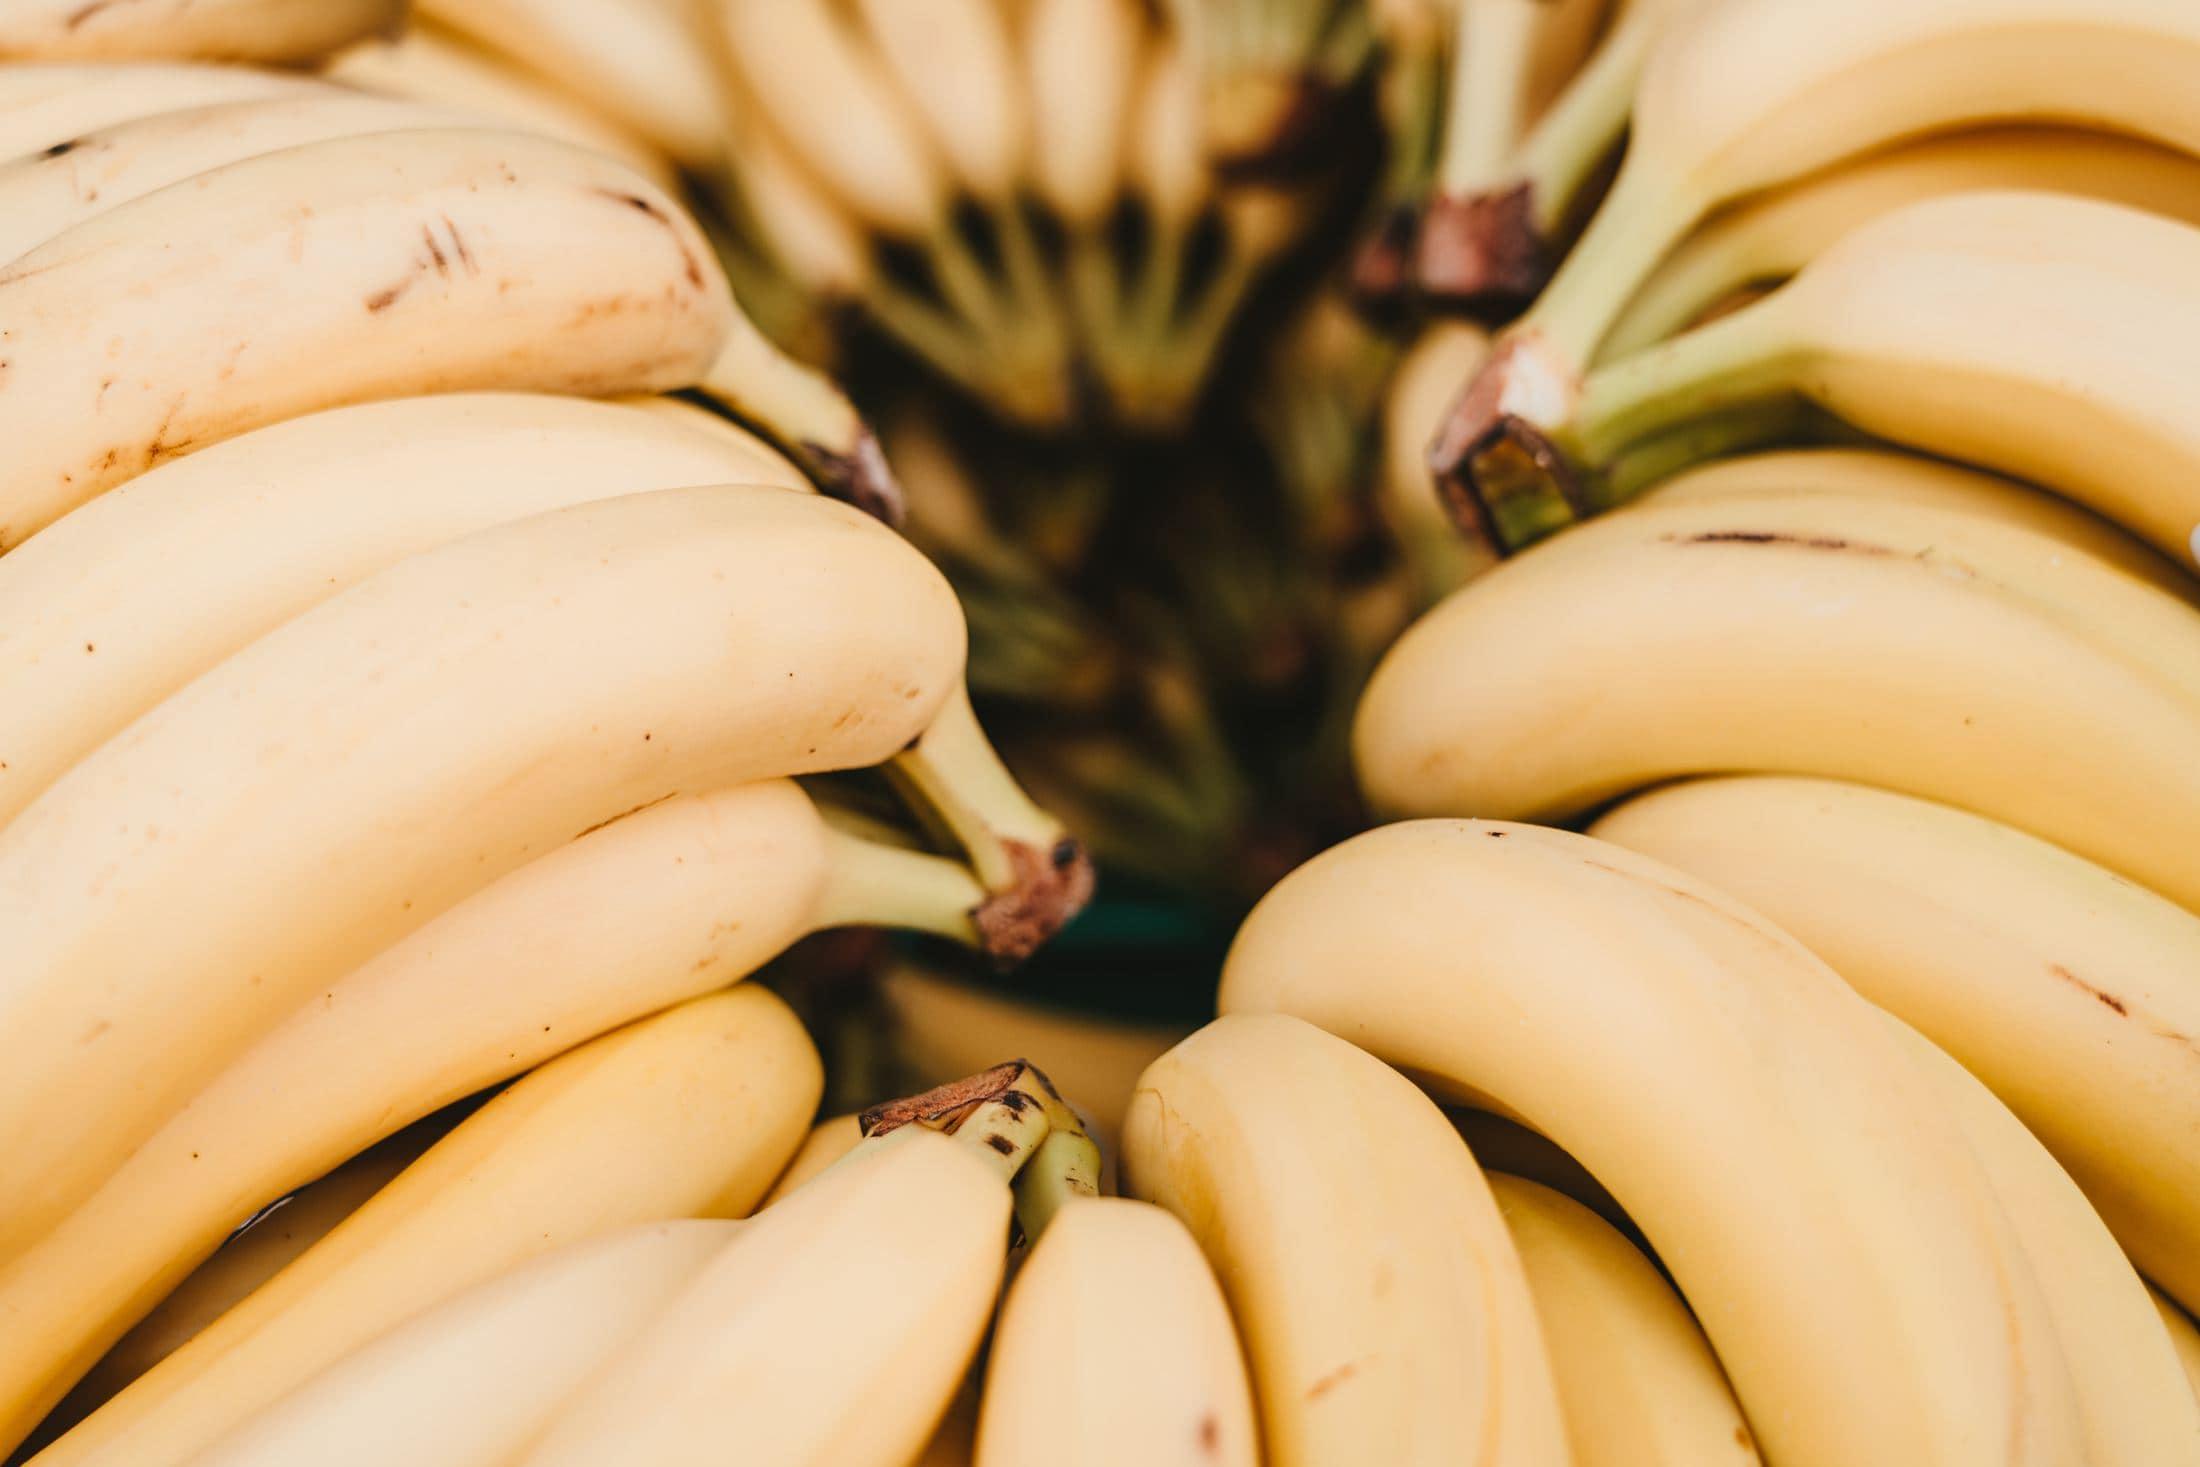 pile of yellow banana fruits